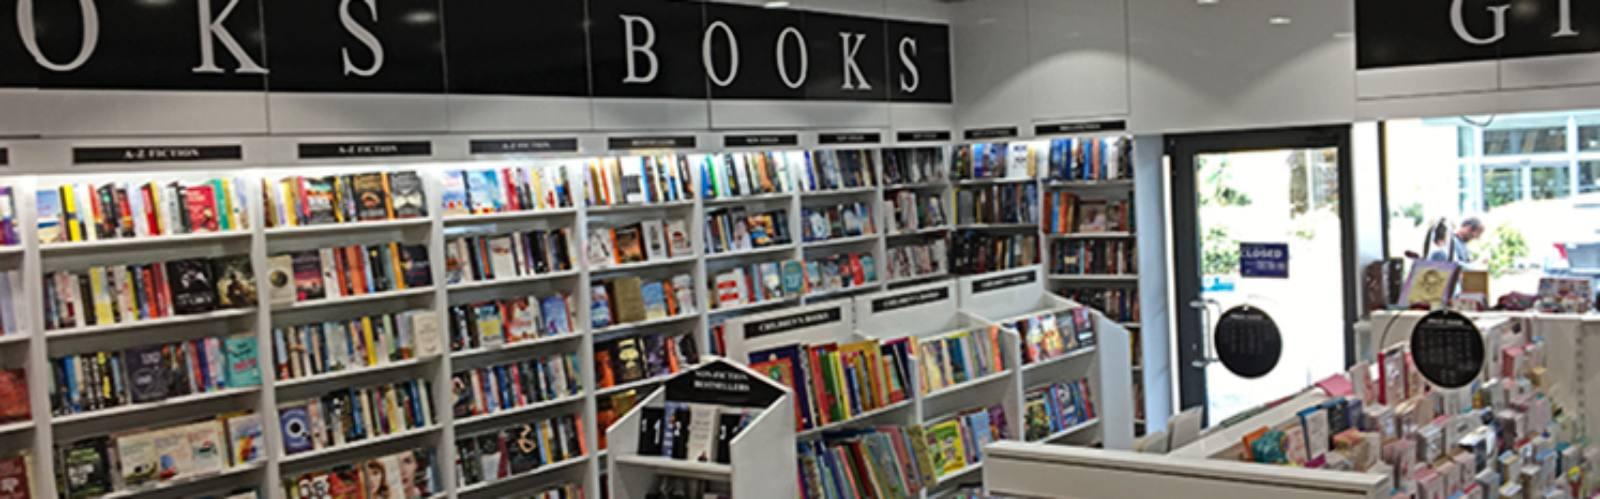 Agenda Bookshop now open at Pama Supermarket